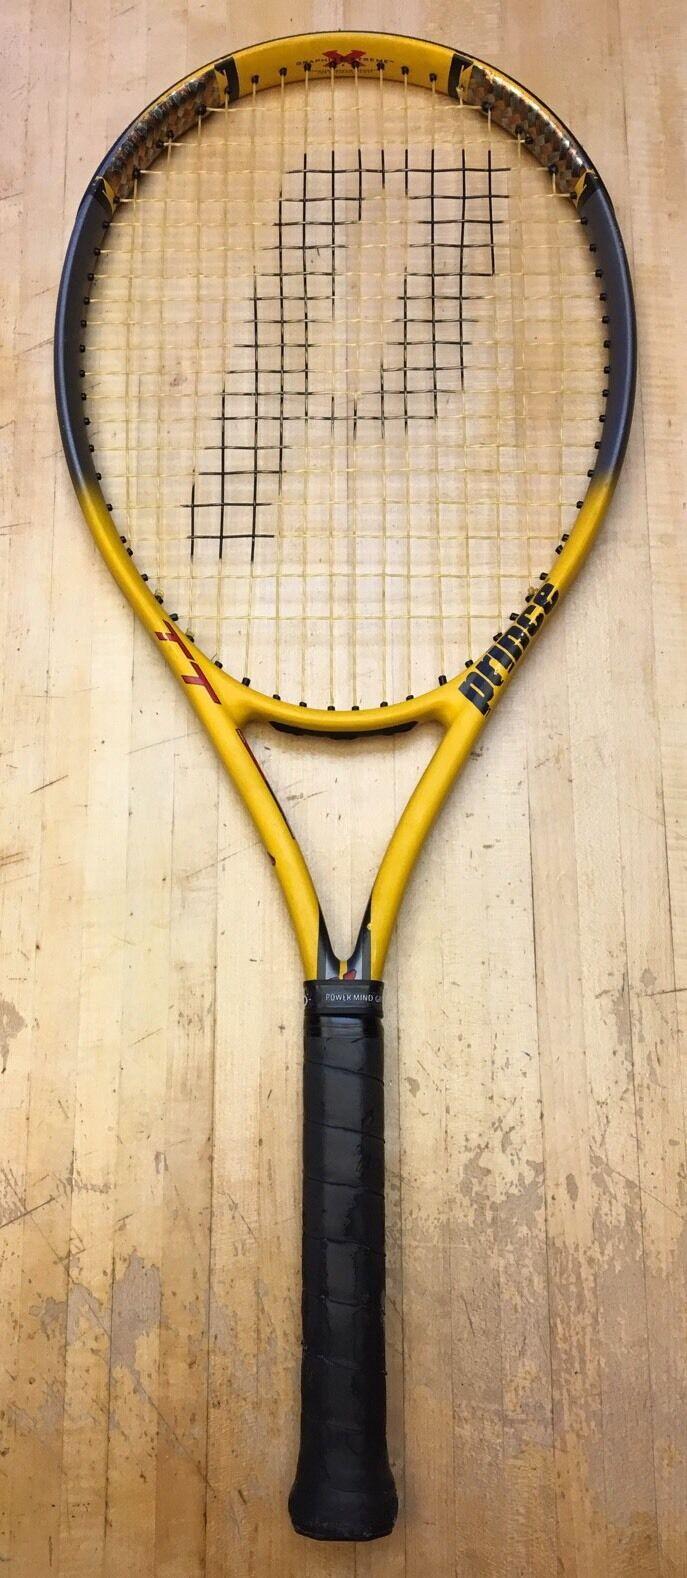 Prince TT Scream OS Triple Threat Tennis Racquet 4 3 8